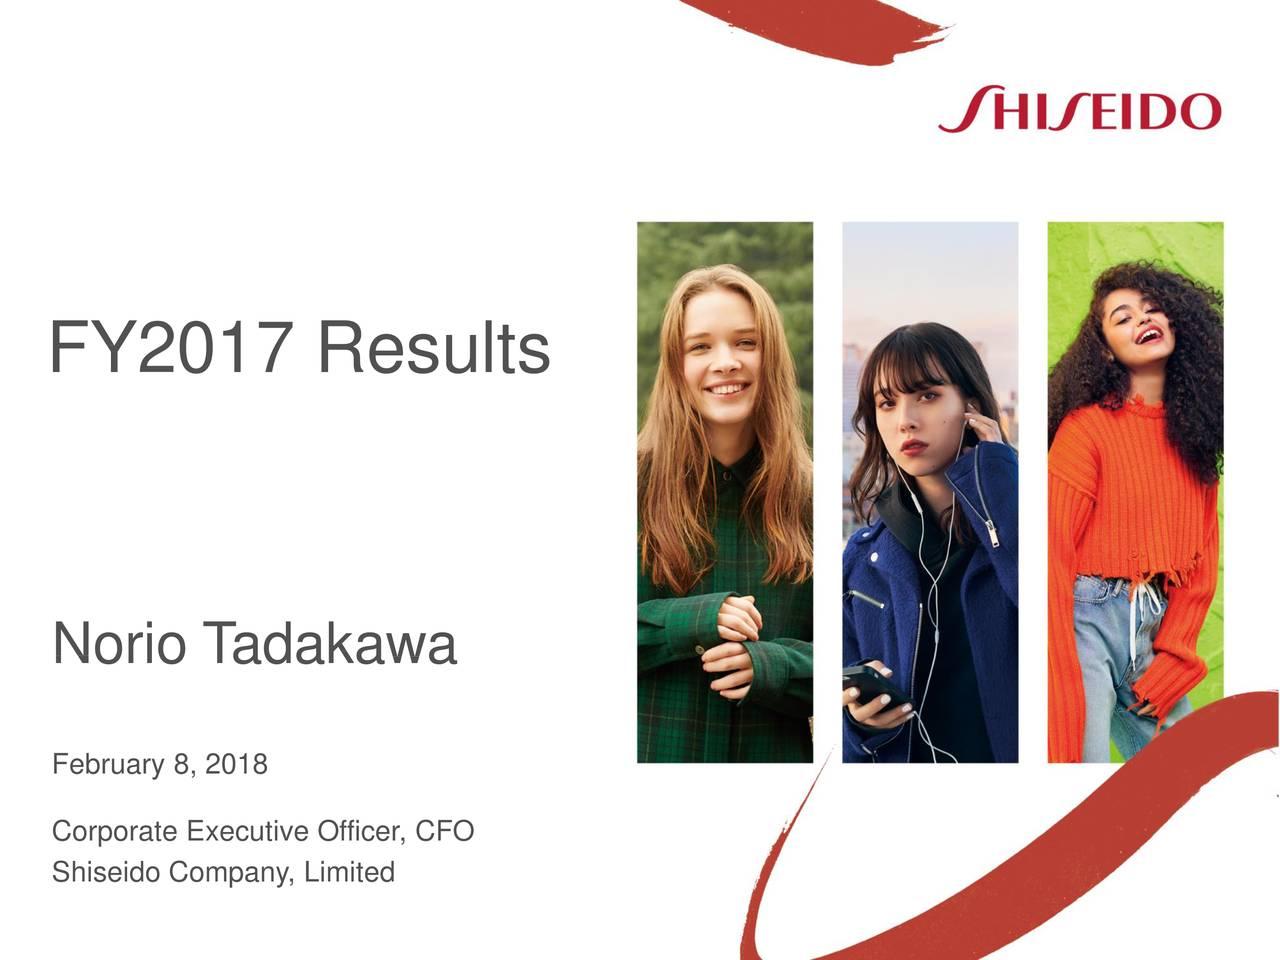 Norio T adakawa February 8, 2018 Corporate Executive Officer, CFO Shiseido Company, Limited